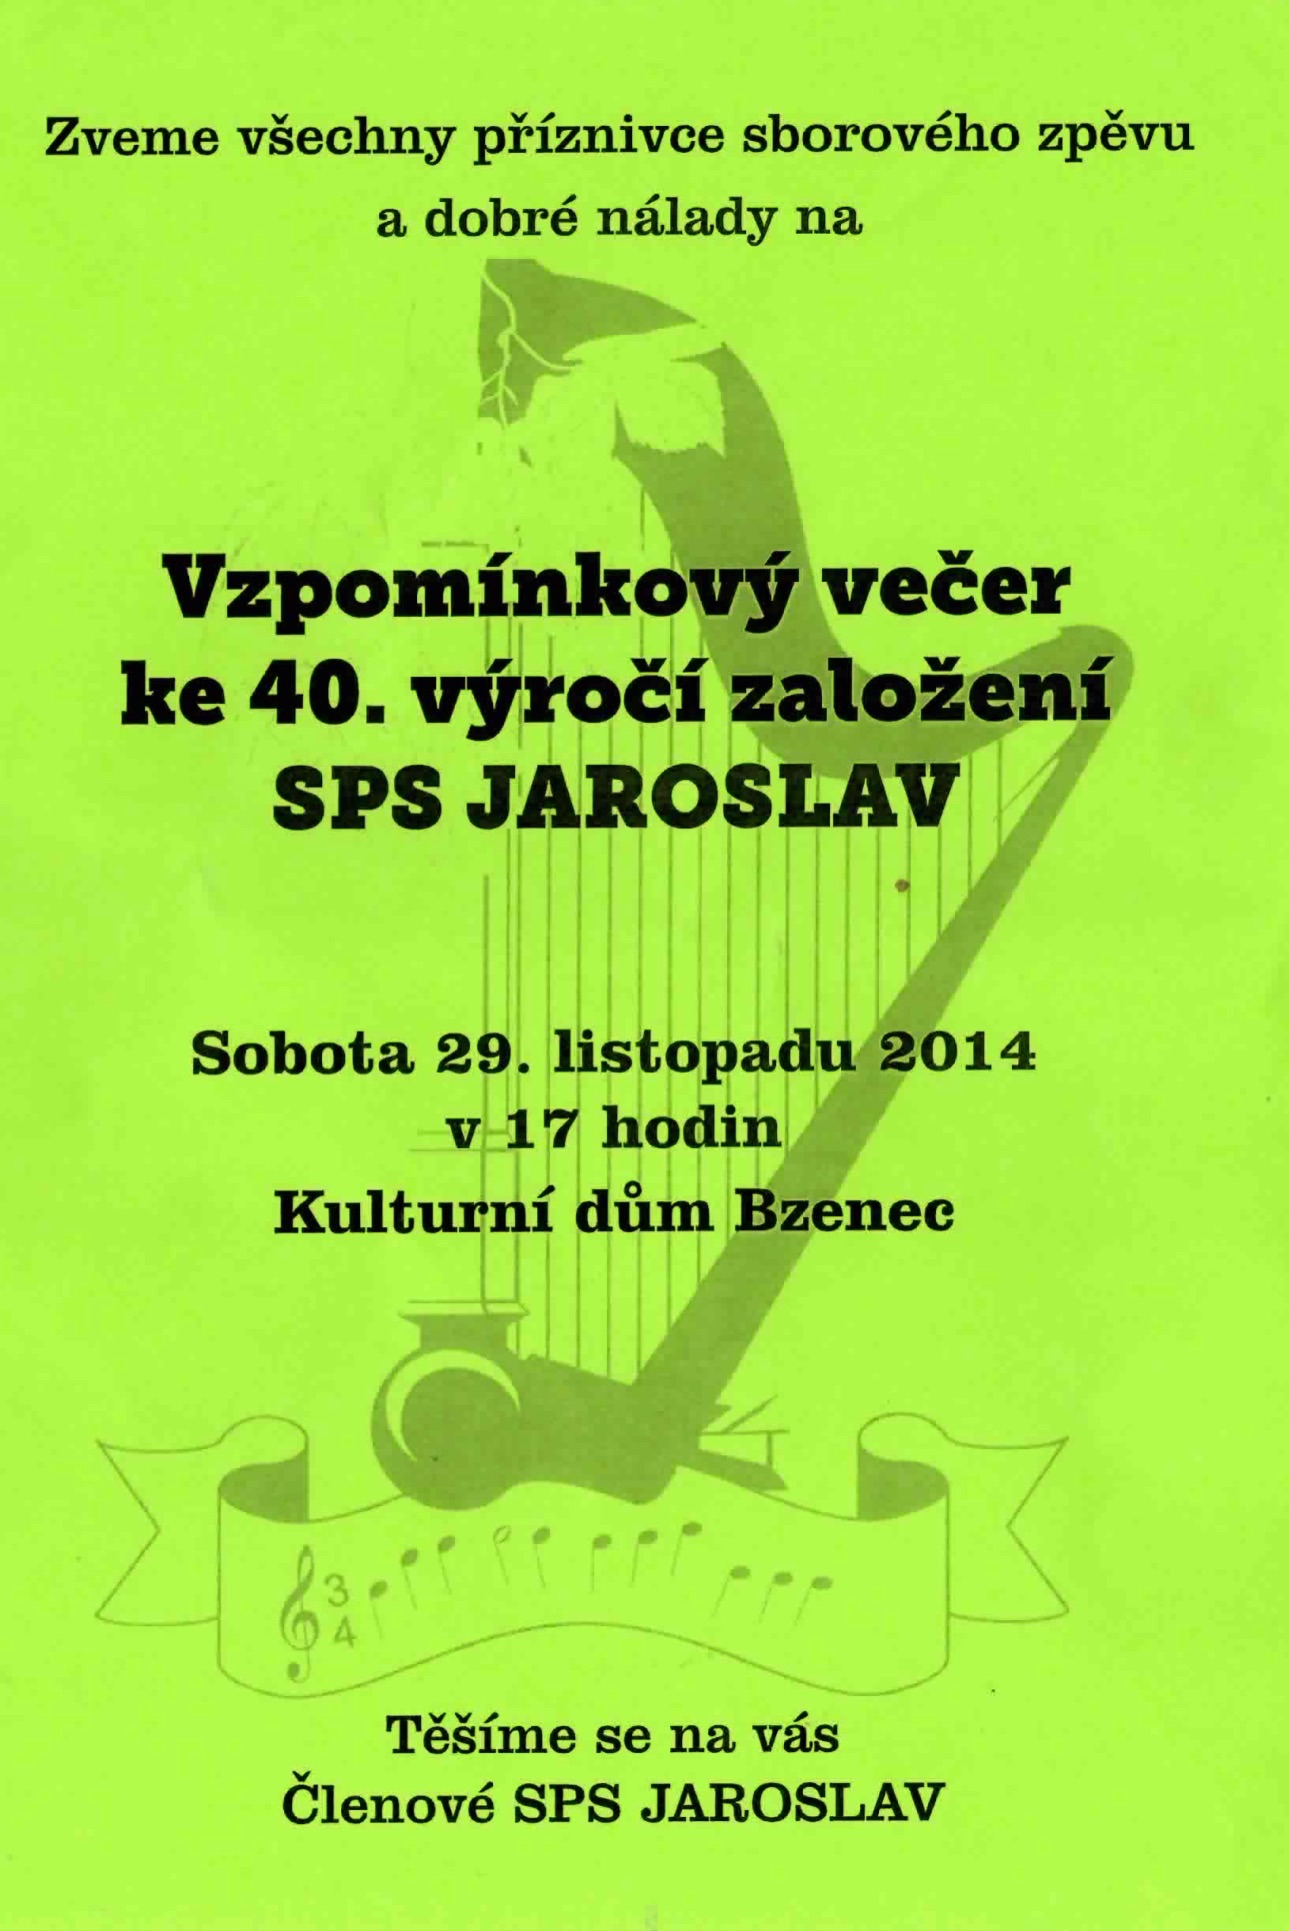 SPS_Jaroslav